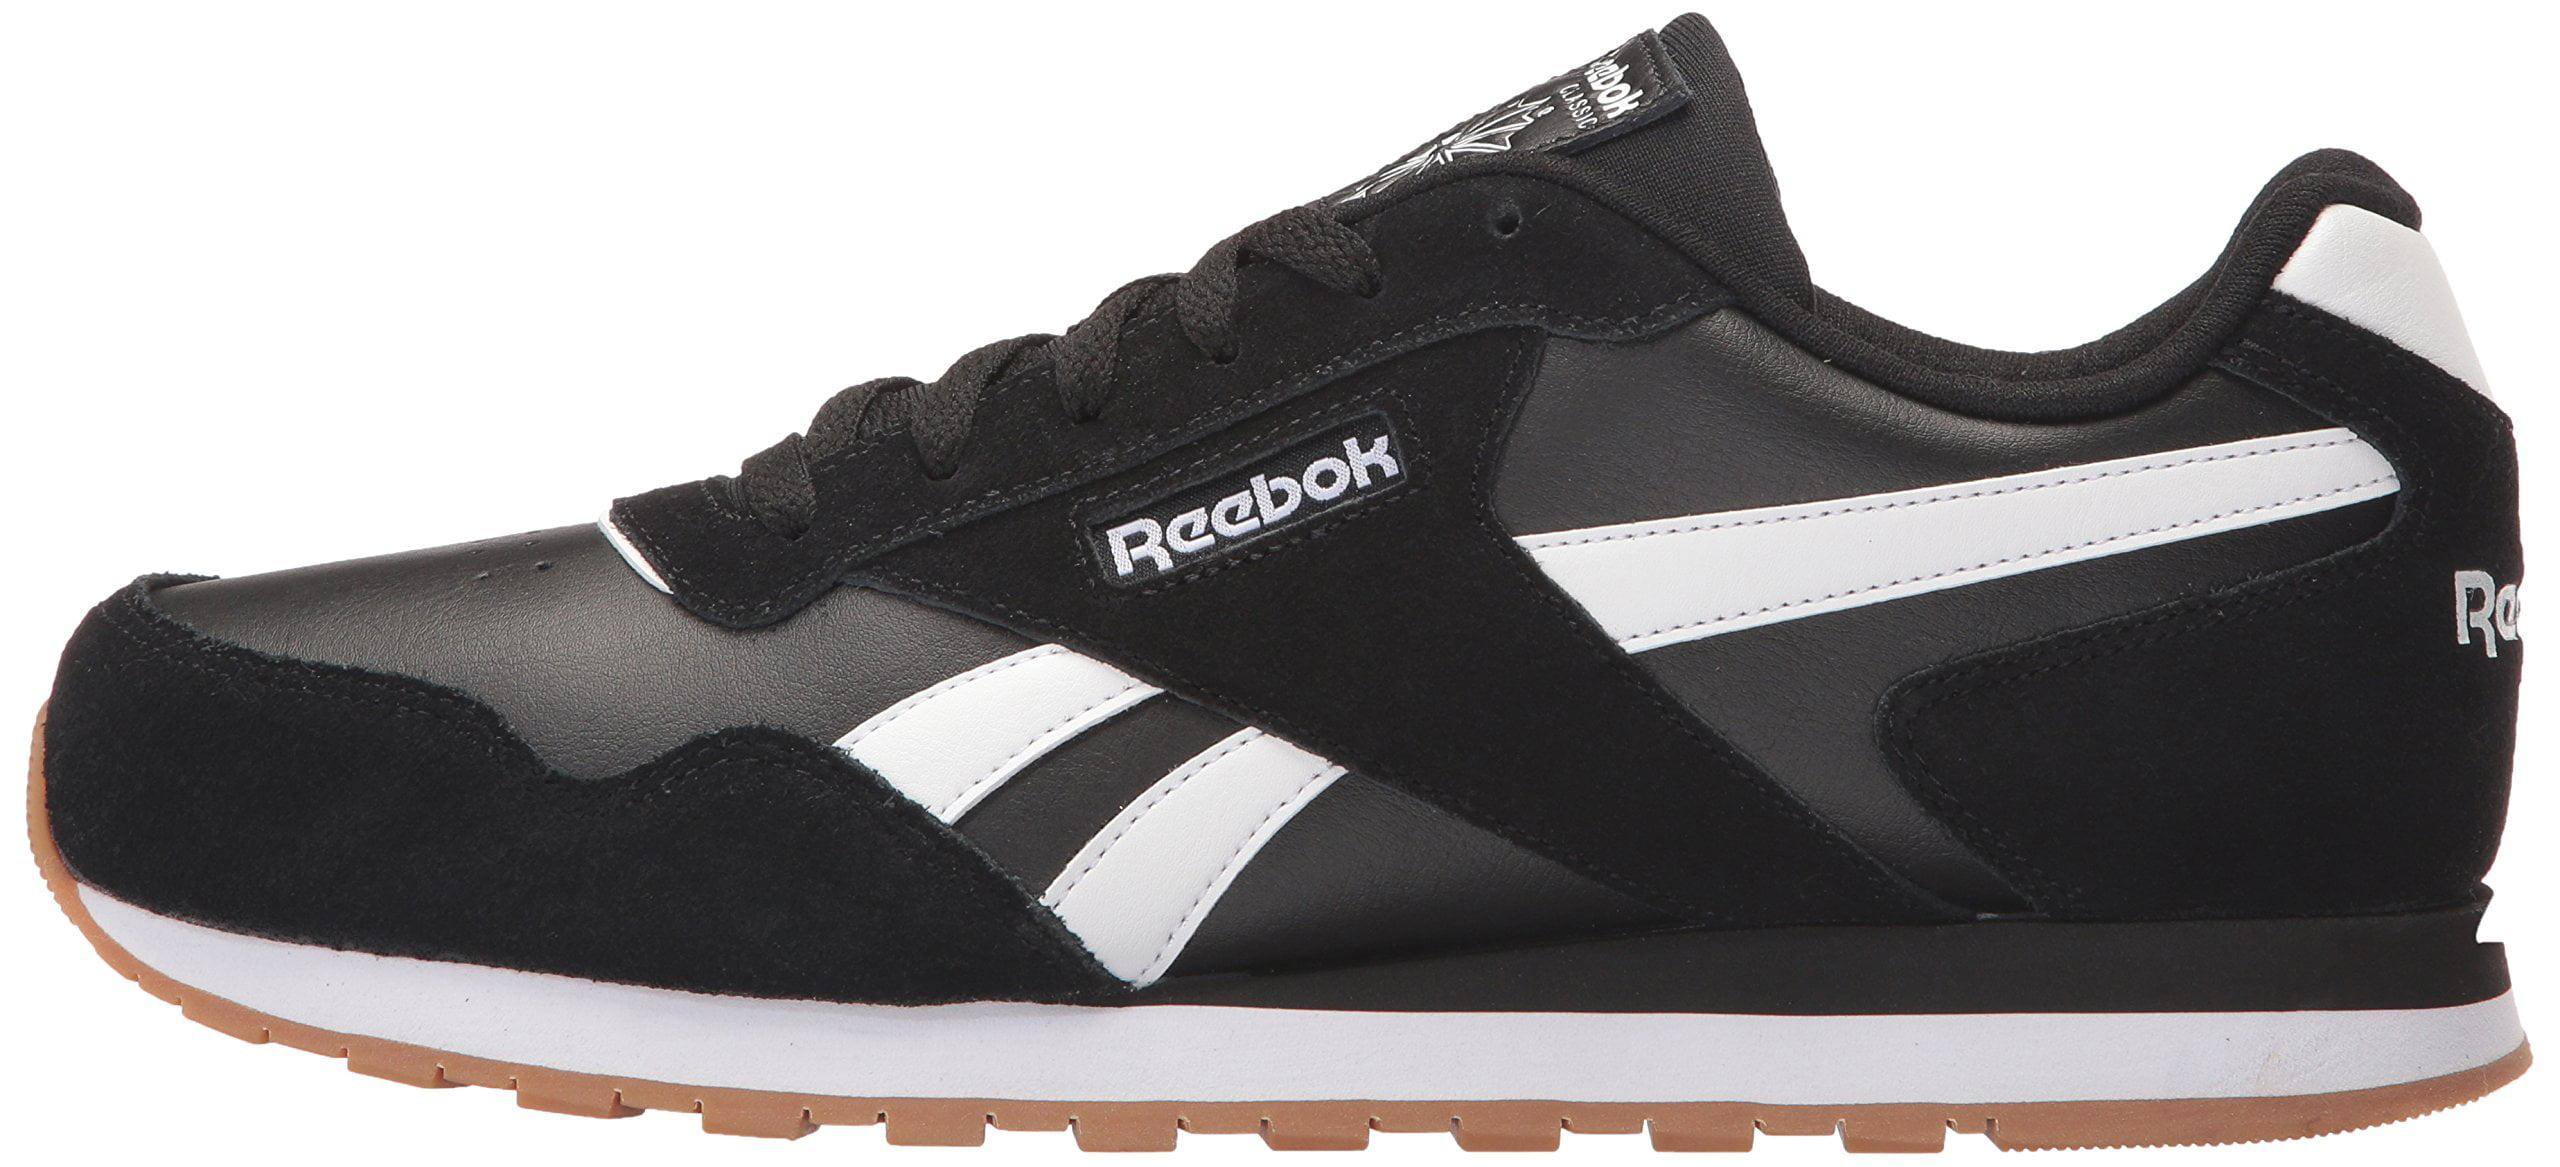 c607f85413f Reebok - Reebok CM9924   Men s Classic Harman Run Sneaker Black White Gum (11  D(M) US) - Walmart.com